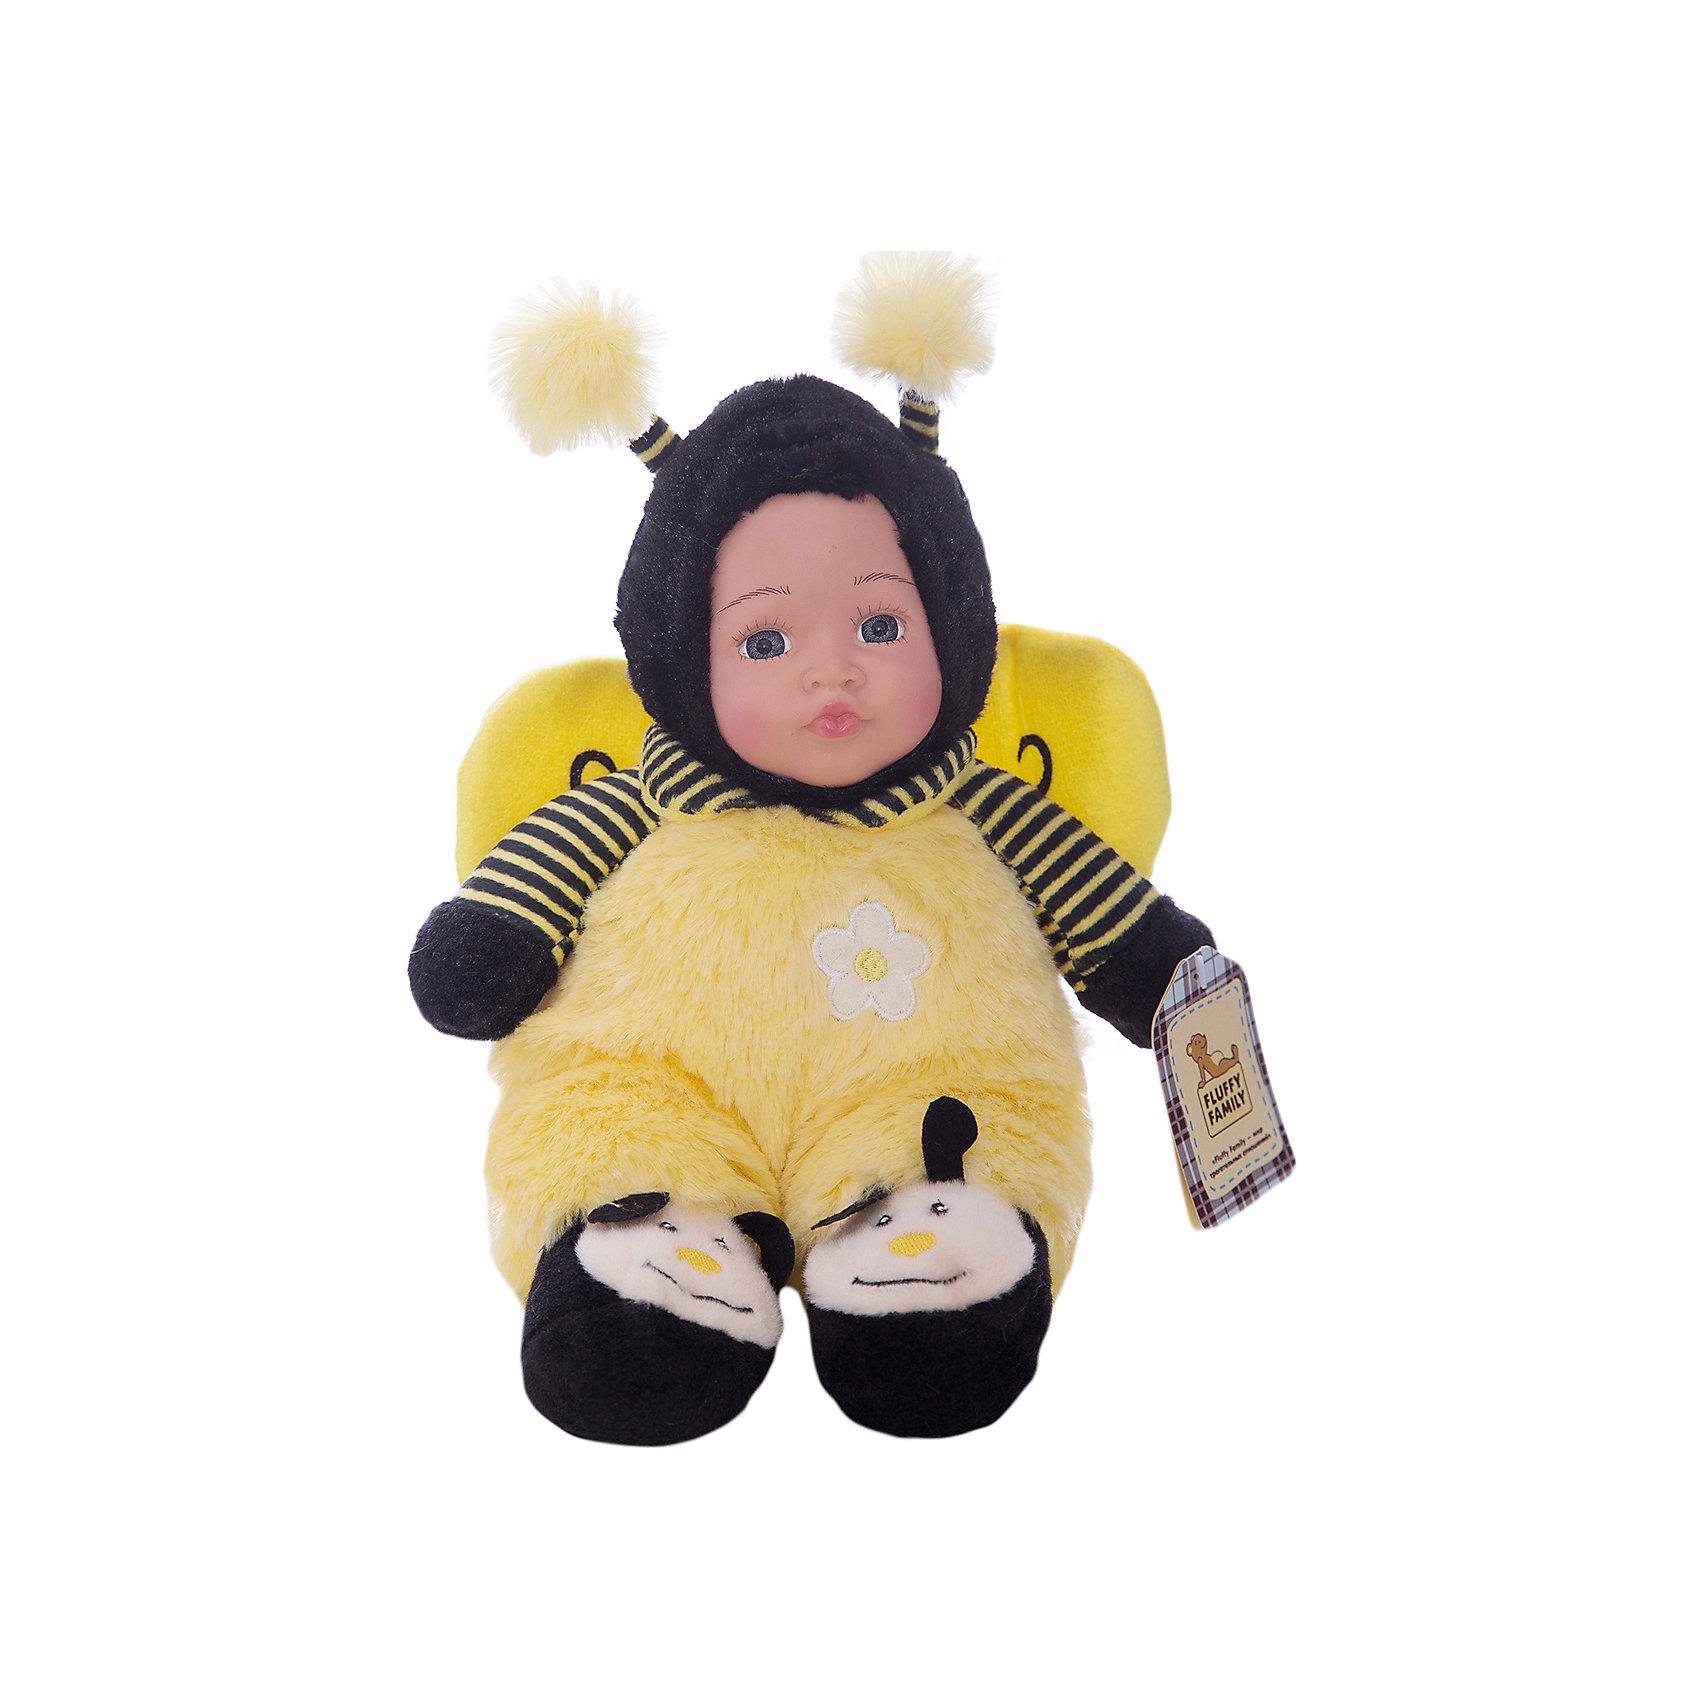 Fluffy Family Игрушка Мой пчеленок, Fluffy Family игрушка мгка fluffy family диджей 681031